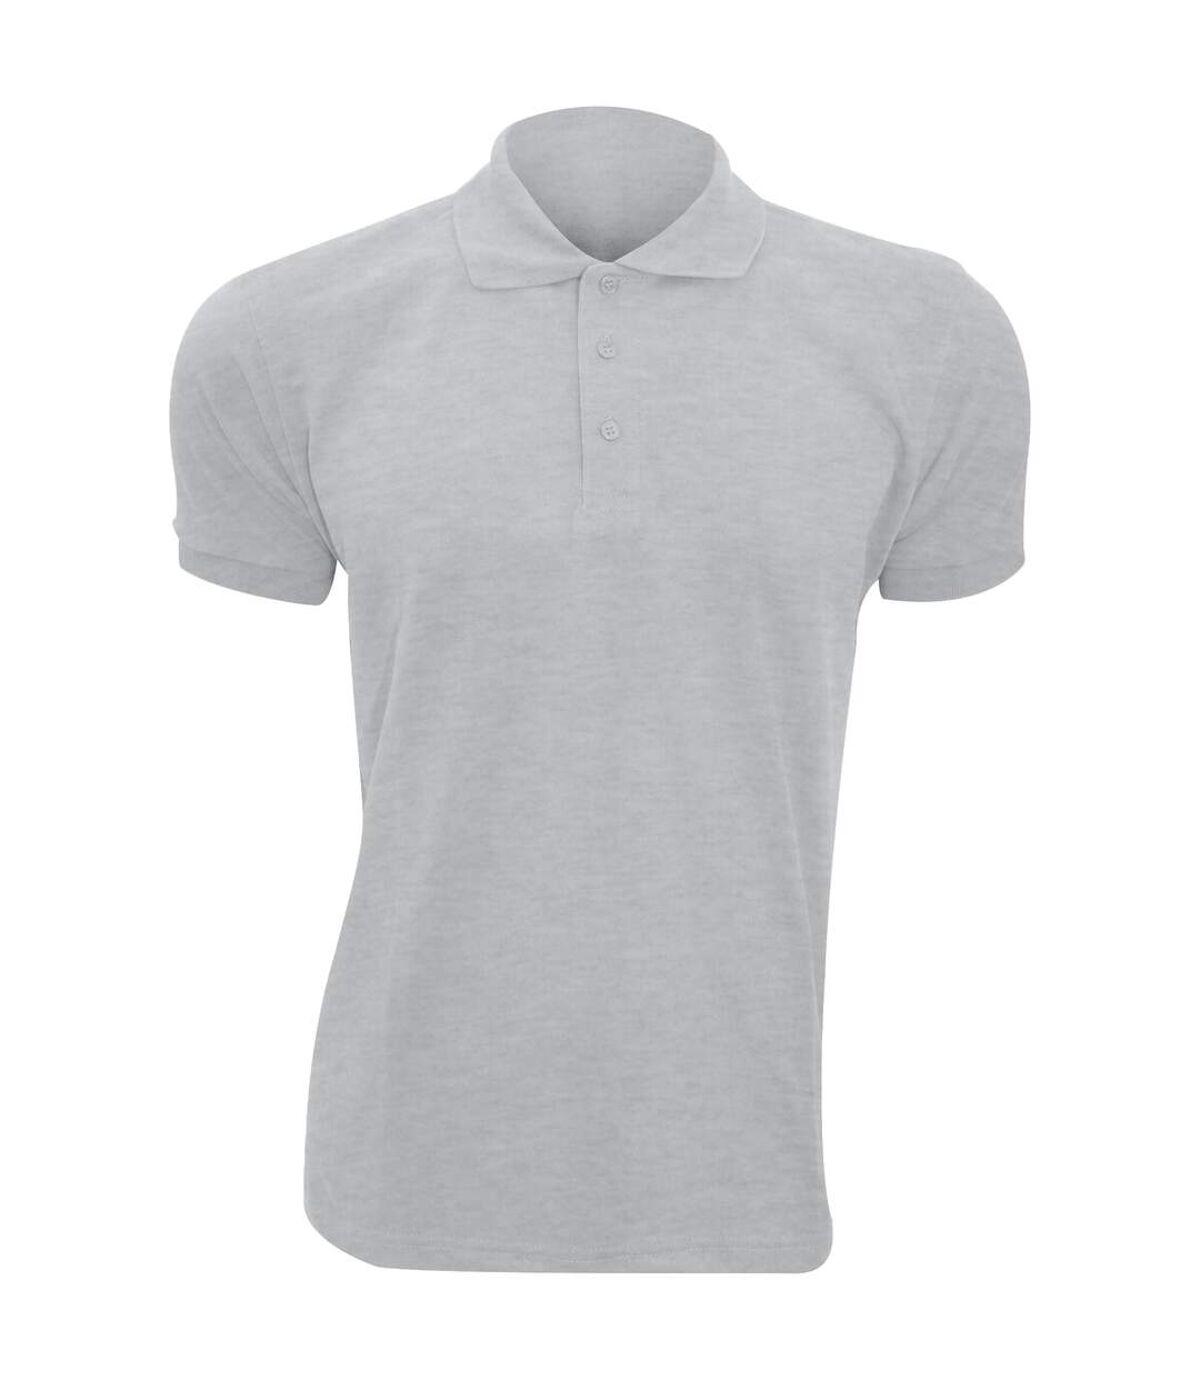 SOLs Mens Prime Pique Plain Short Sleeve Polo Shirt (Royal Blue) - UTPC493